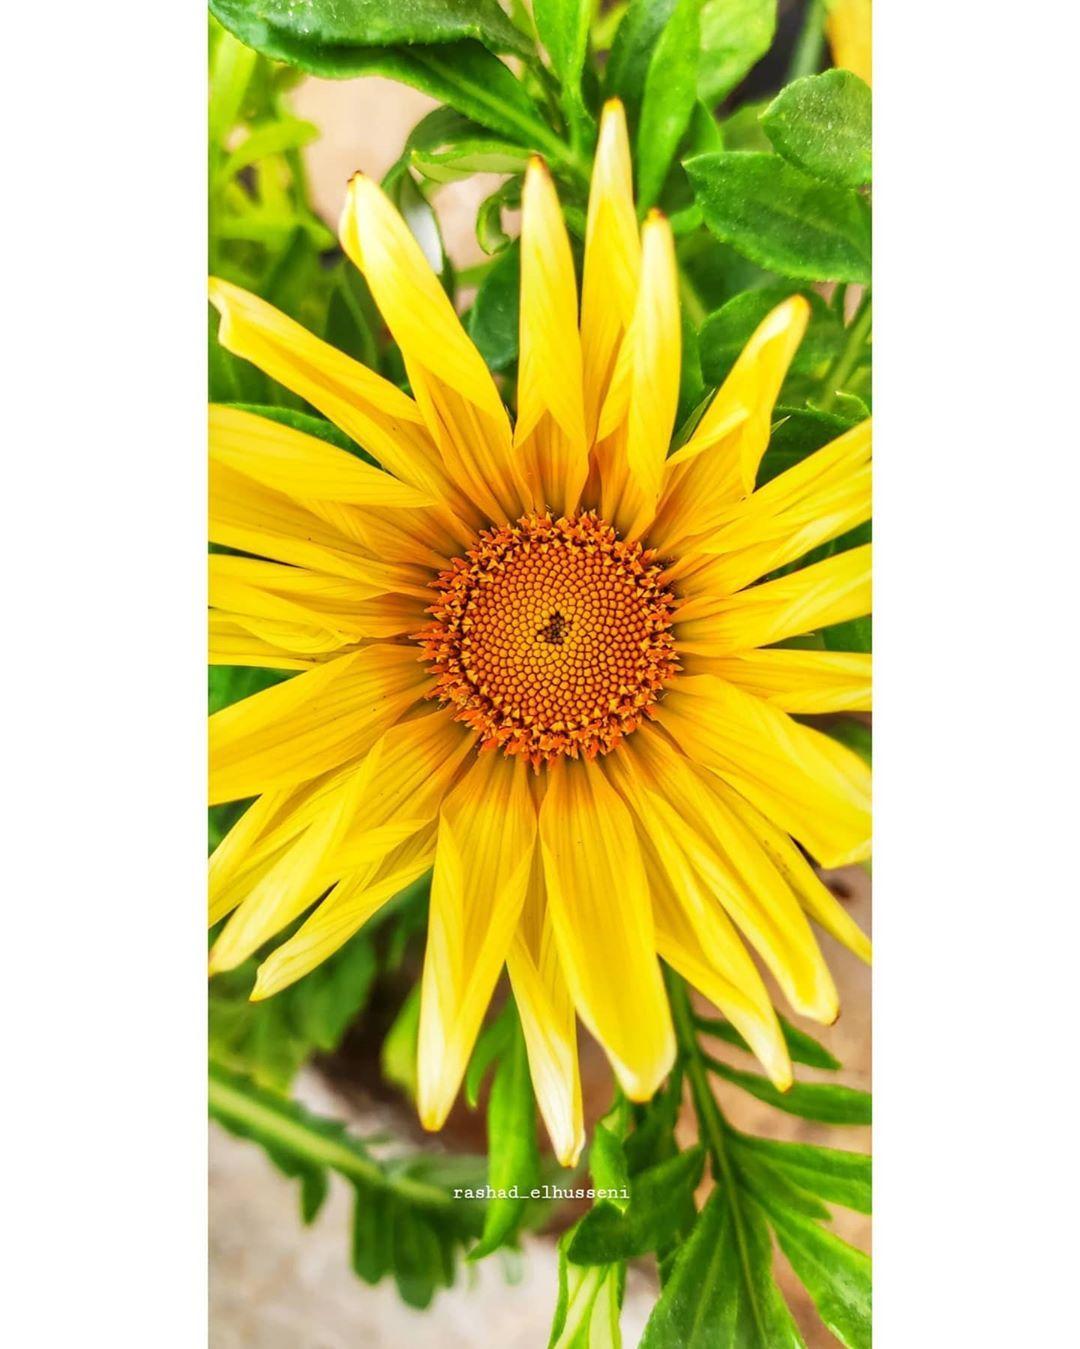 Pin By Rashad Elhusseni On Flower Plants Flowers